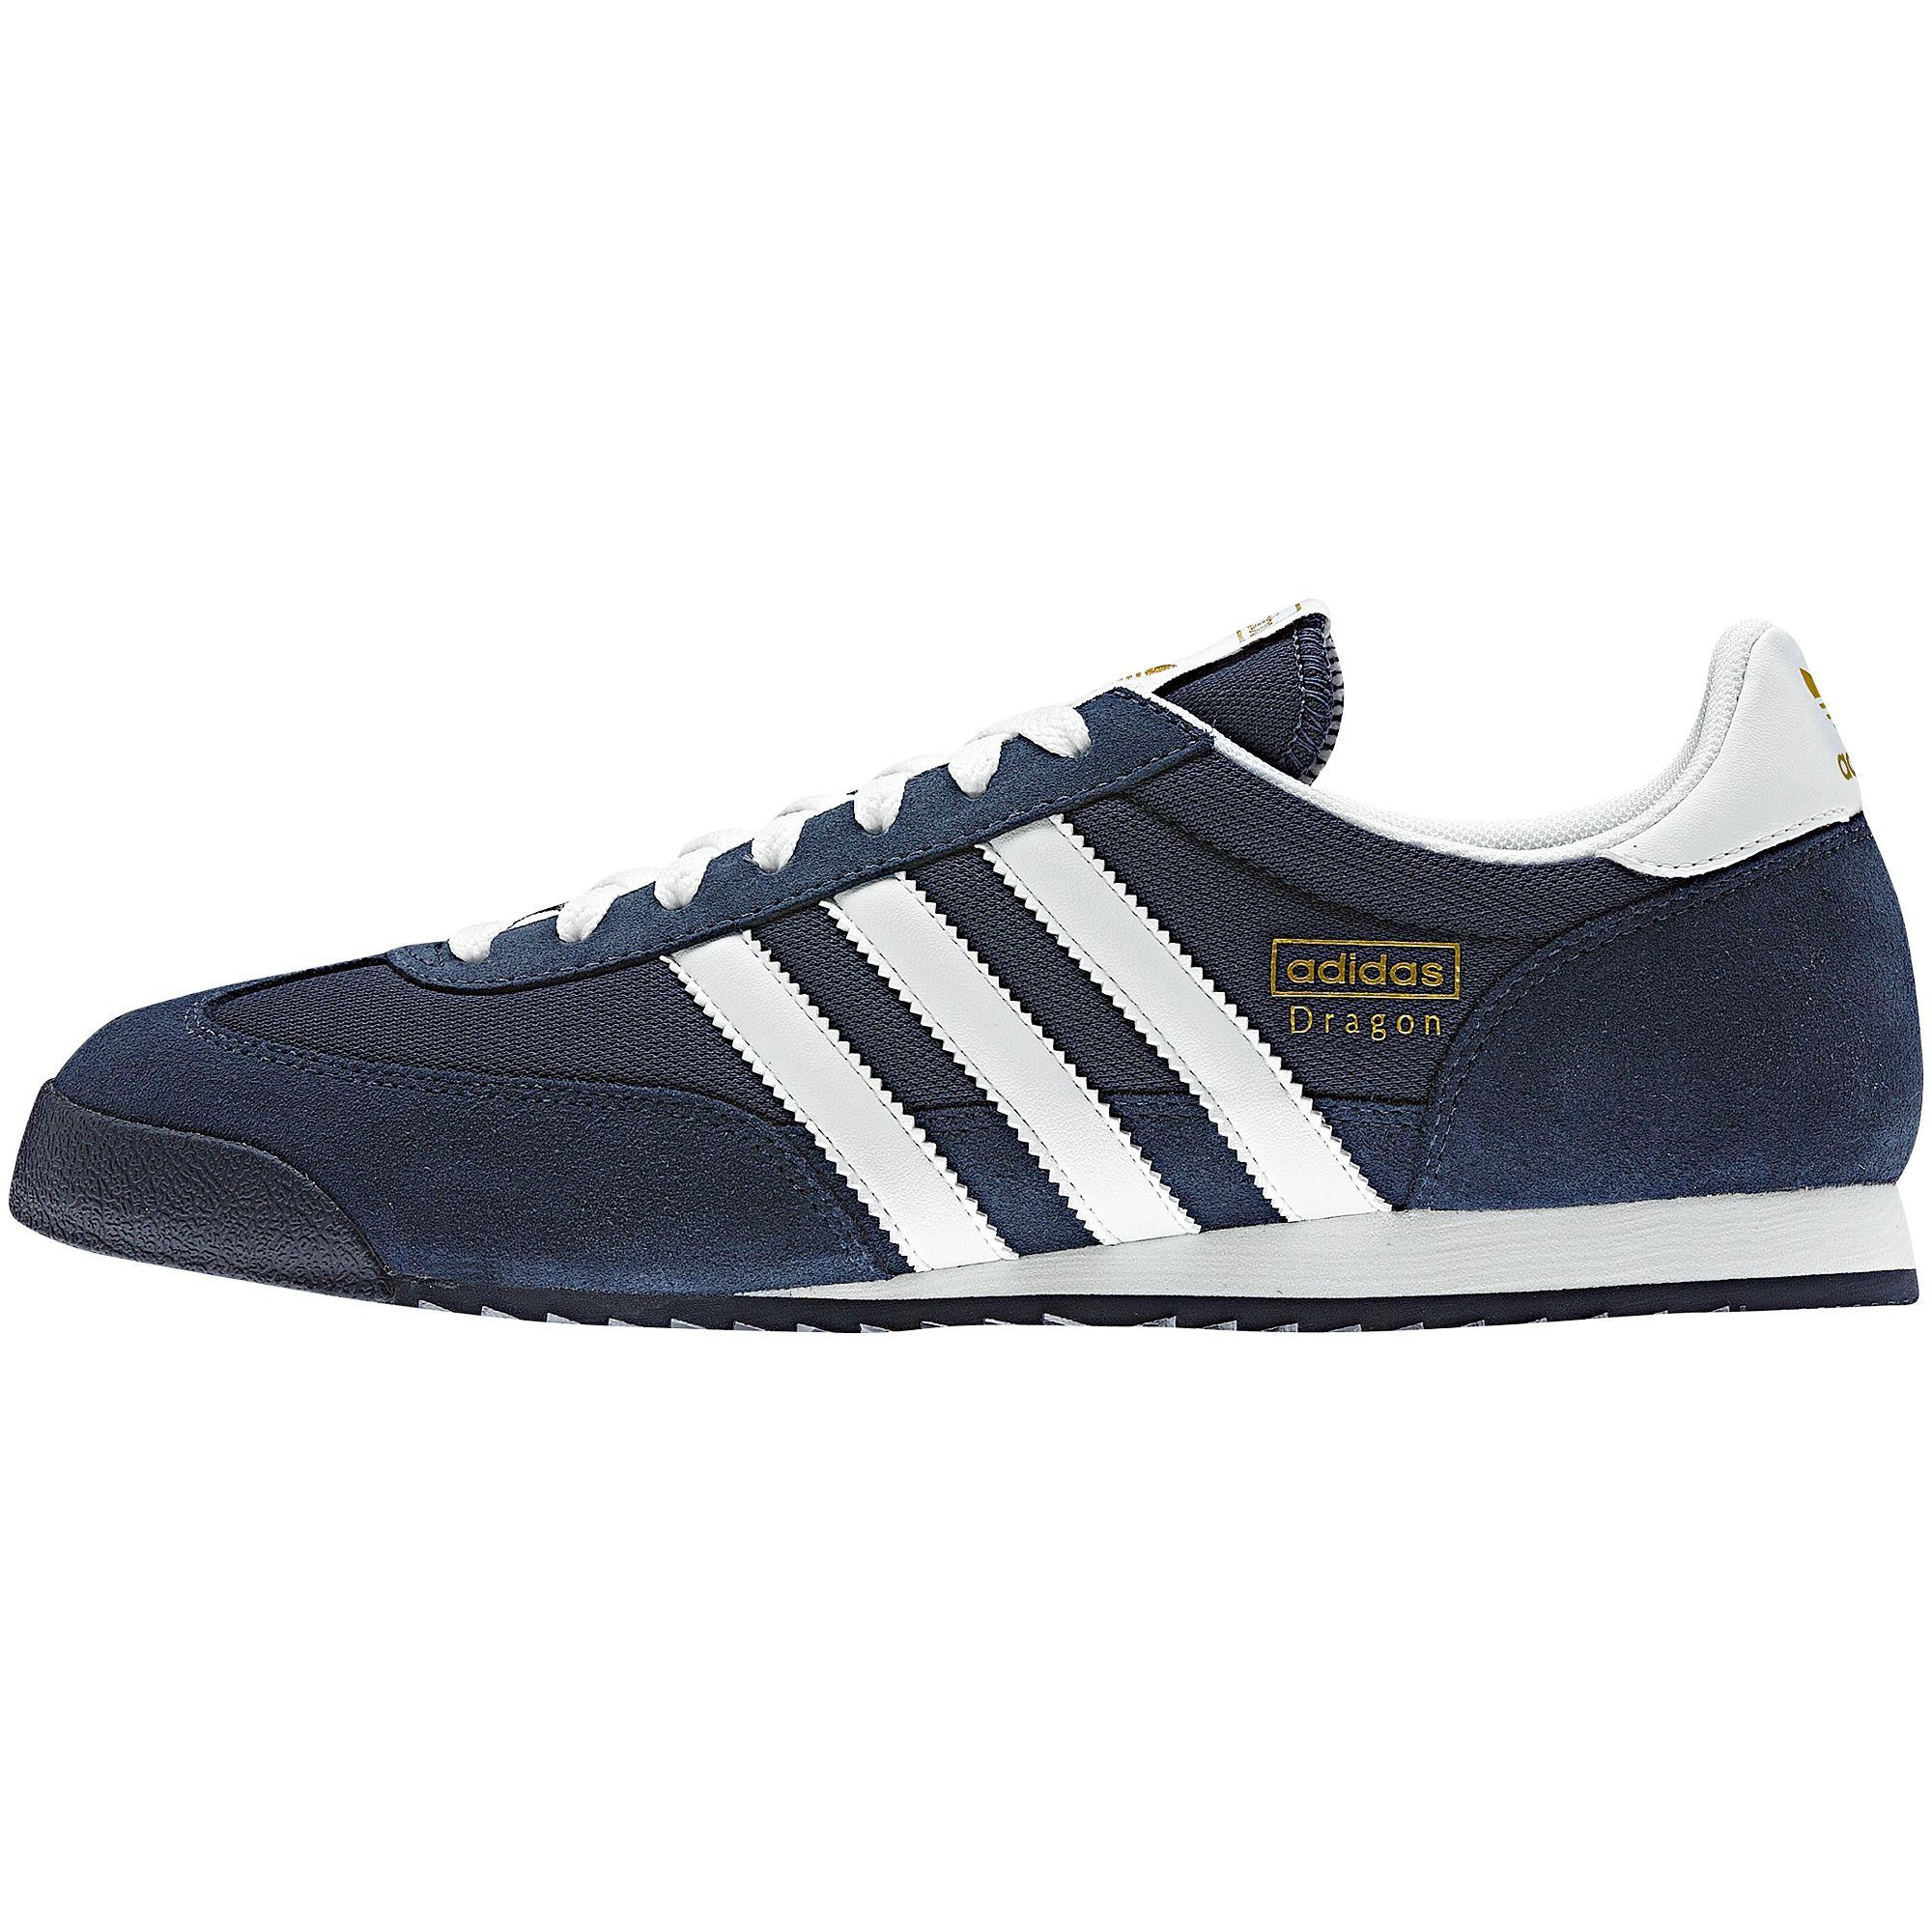 adidas Dragon Shoes | adidas US | Shoes sneakers adidas, Adidas ...